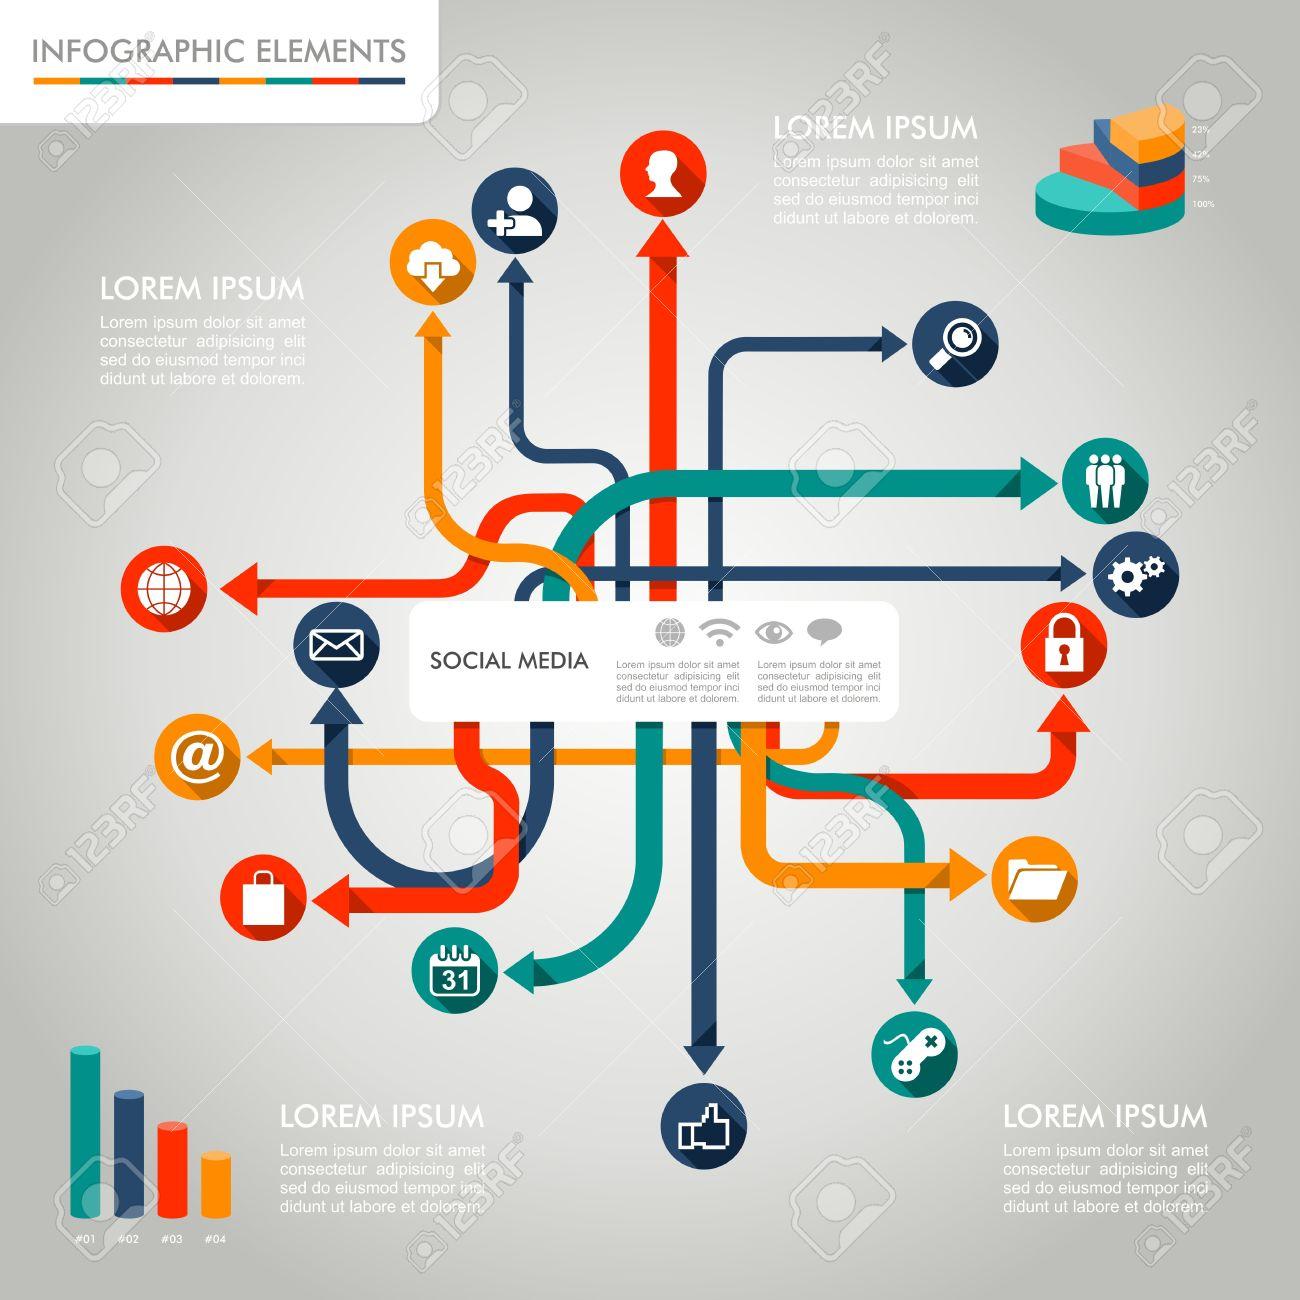 social media networks infographic